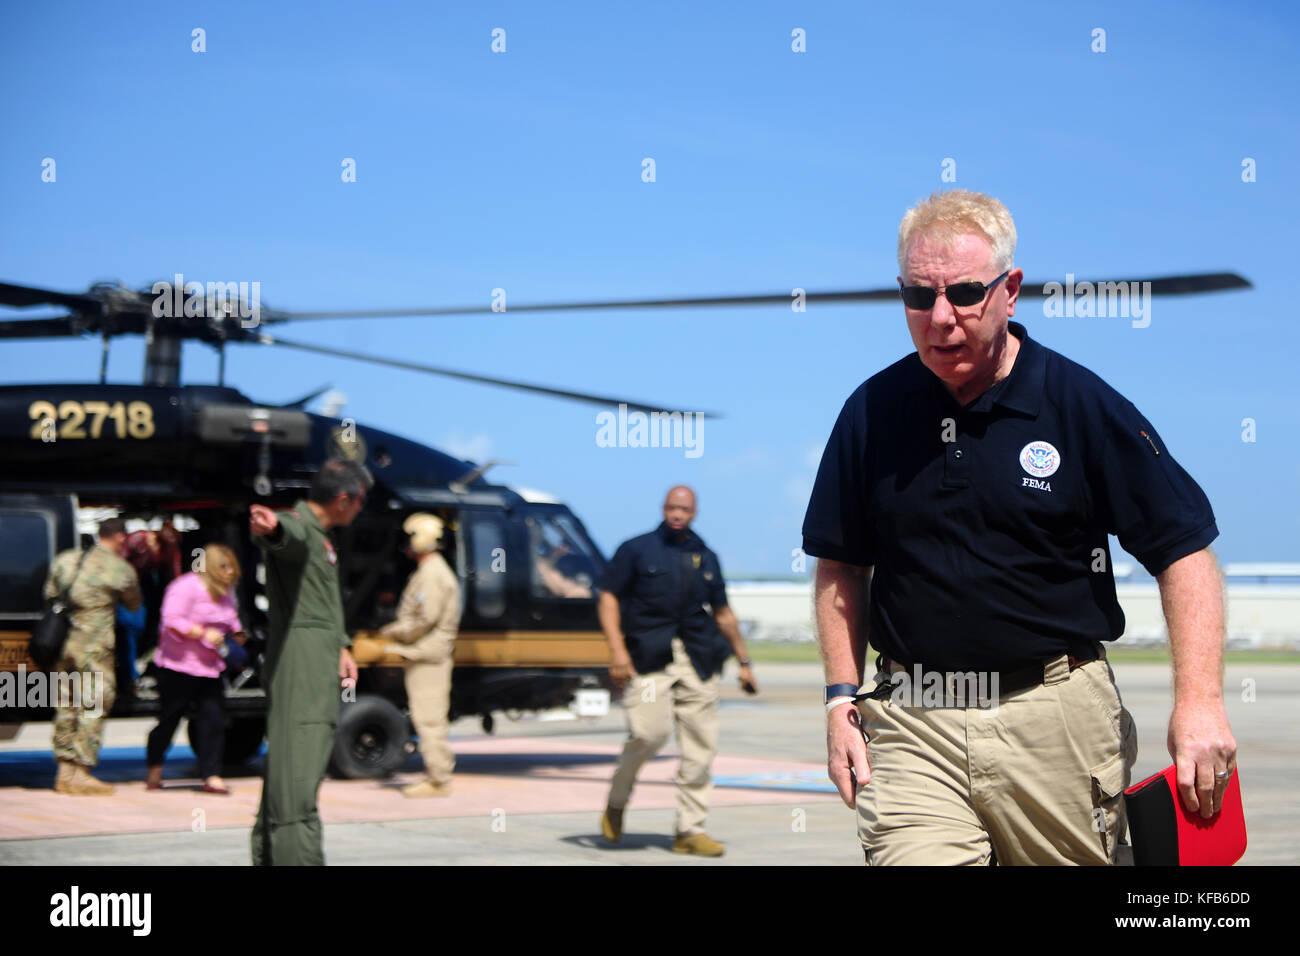 Federal Emergency Management Agency (FEMA) Federal Coordinating Officer Michael Byrne arrives at the Isla Grande - Stock Image